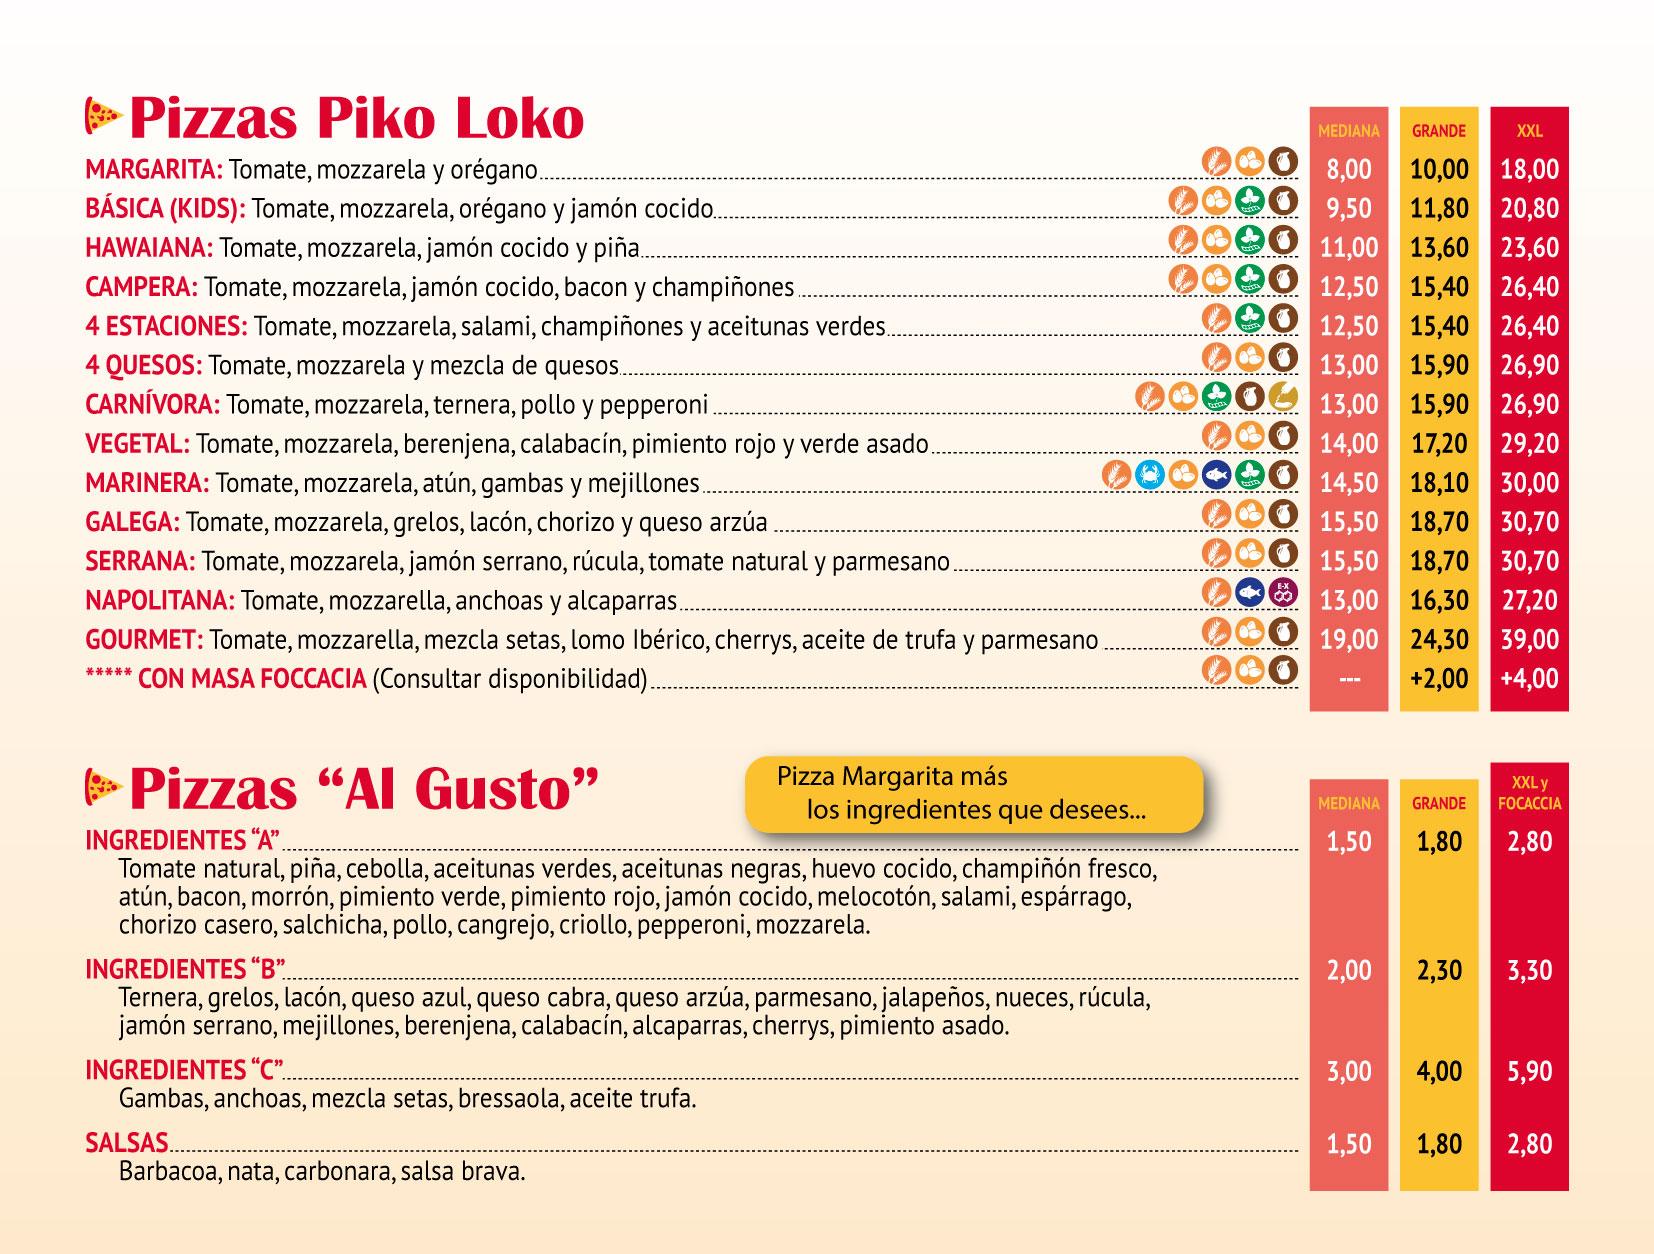 piko_loko_pizzas